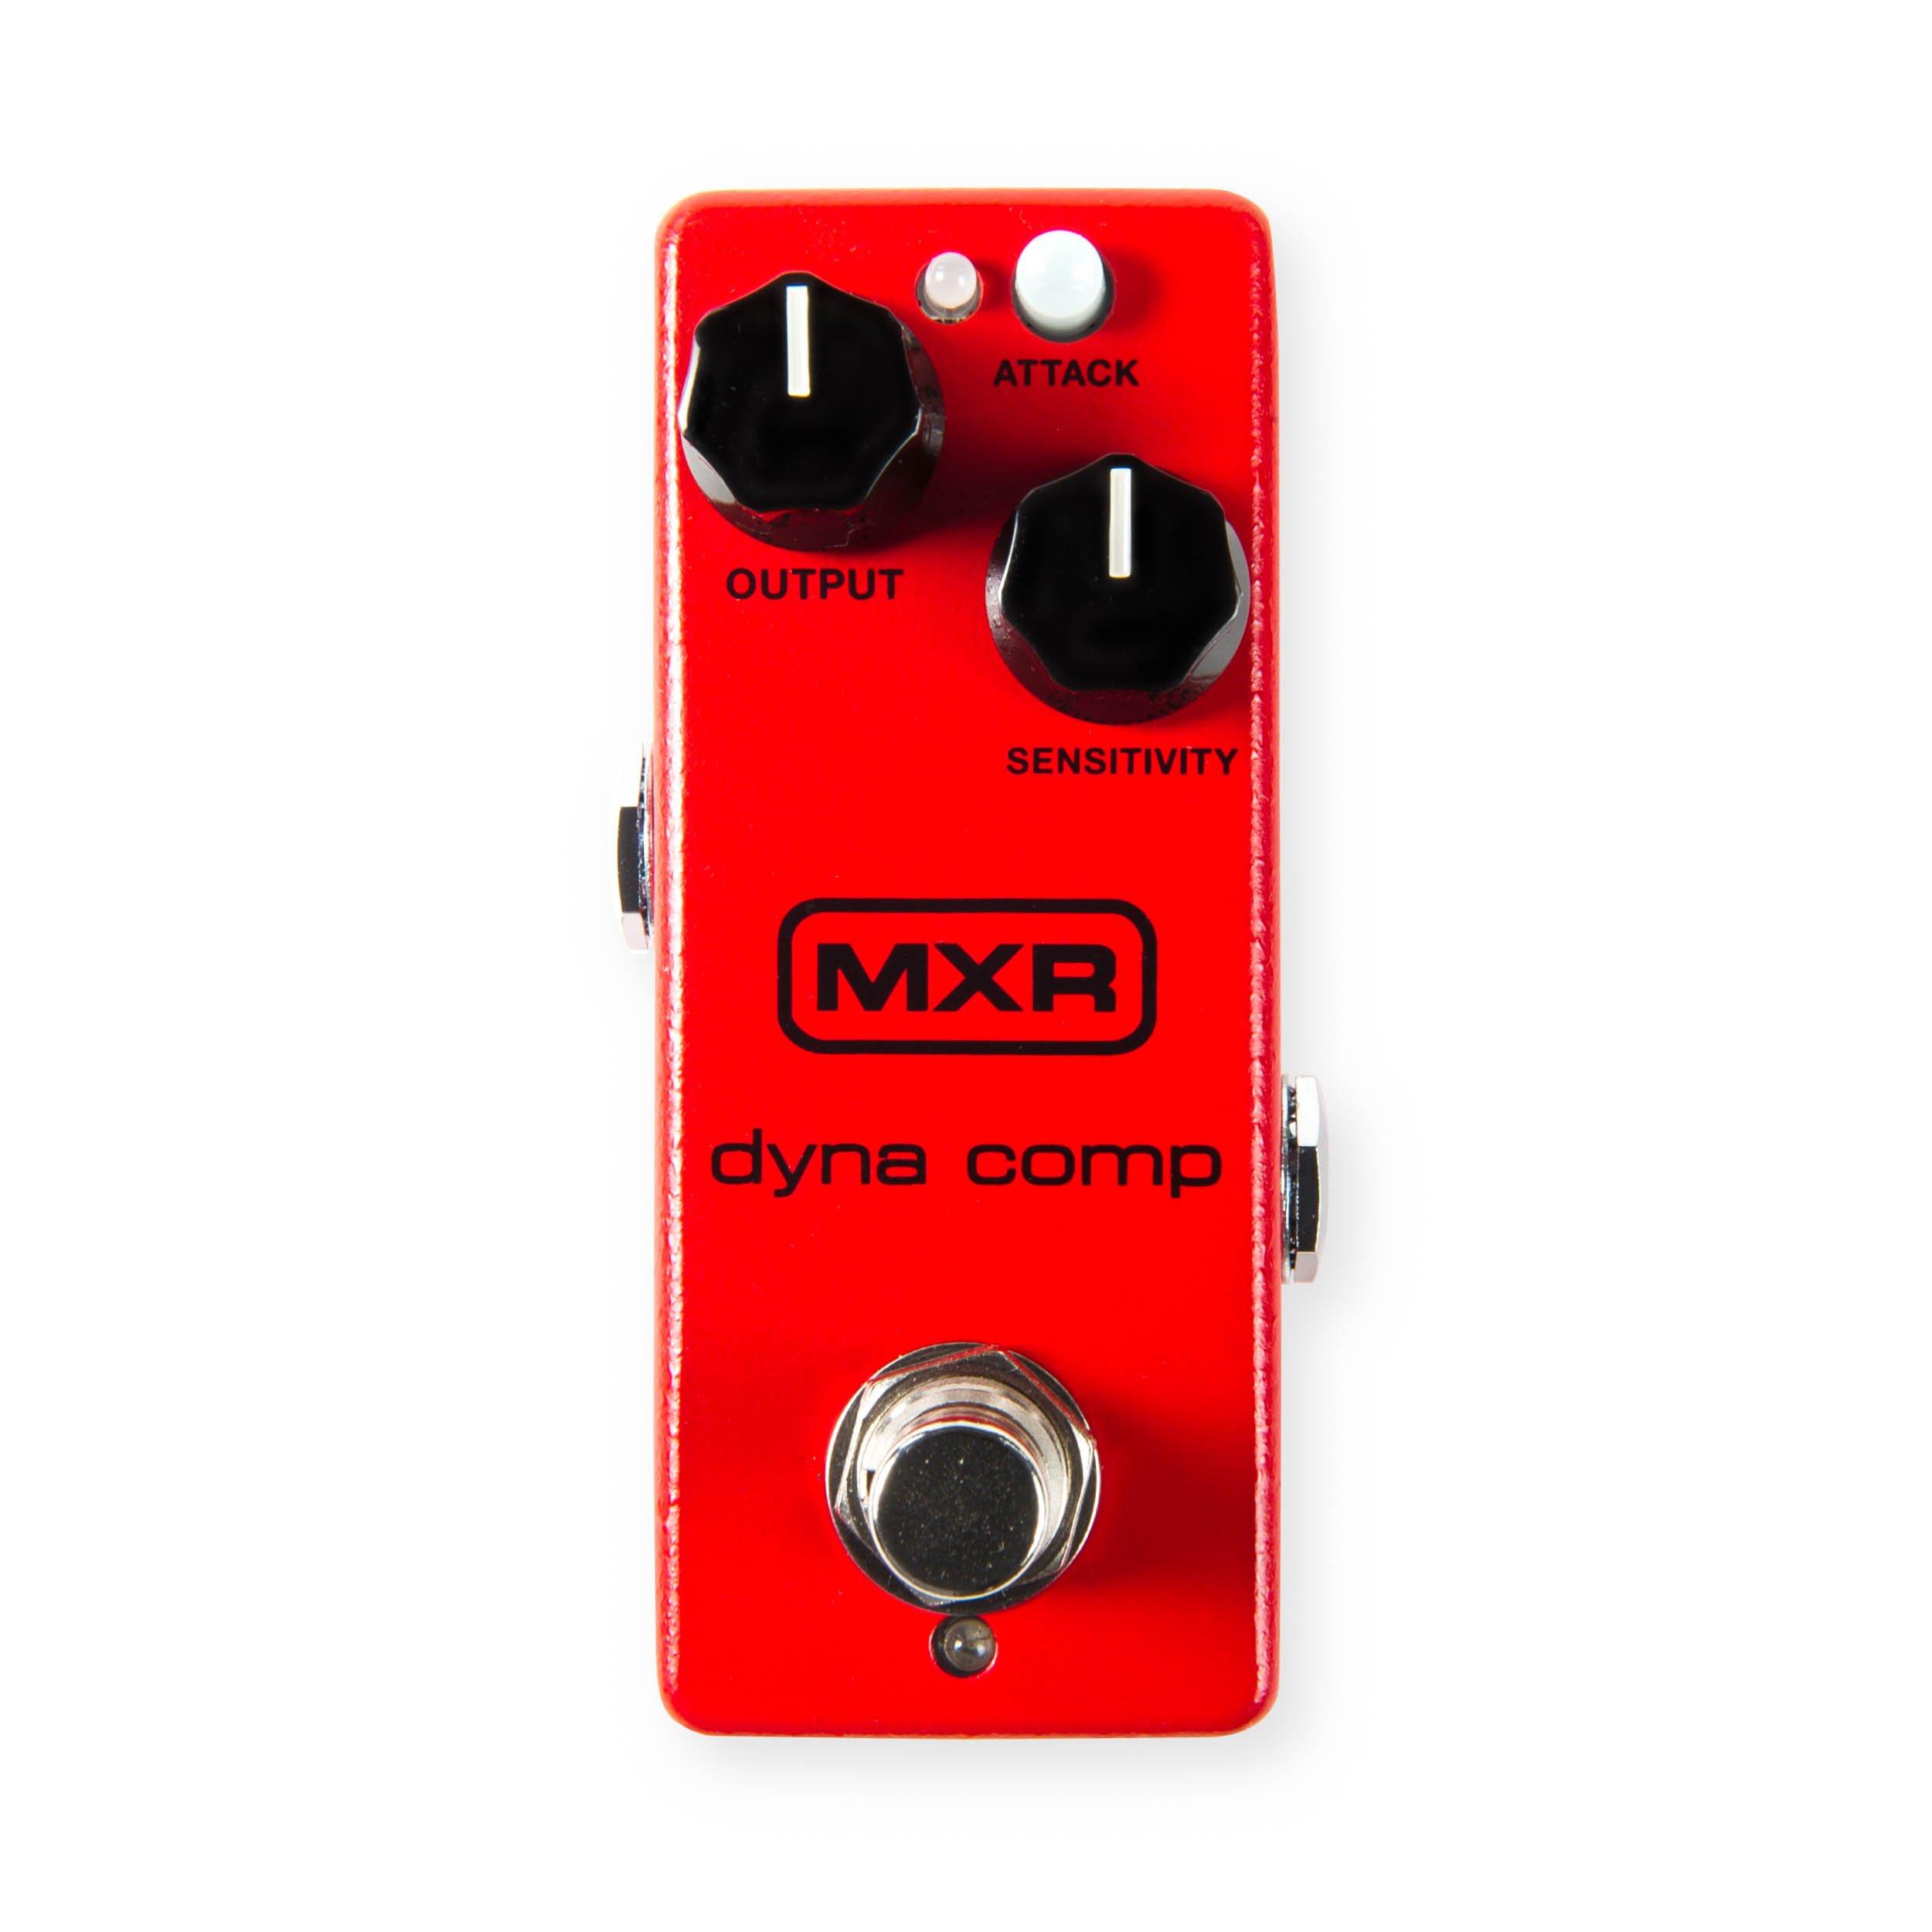 MXR M291 Dyna Comp Mini Compressor Guitar Effects Pedal by MXR